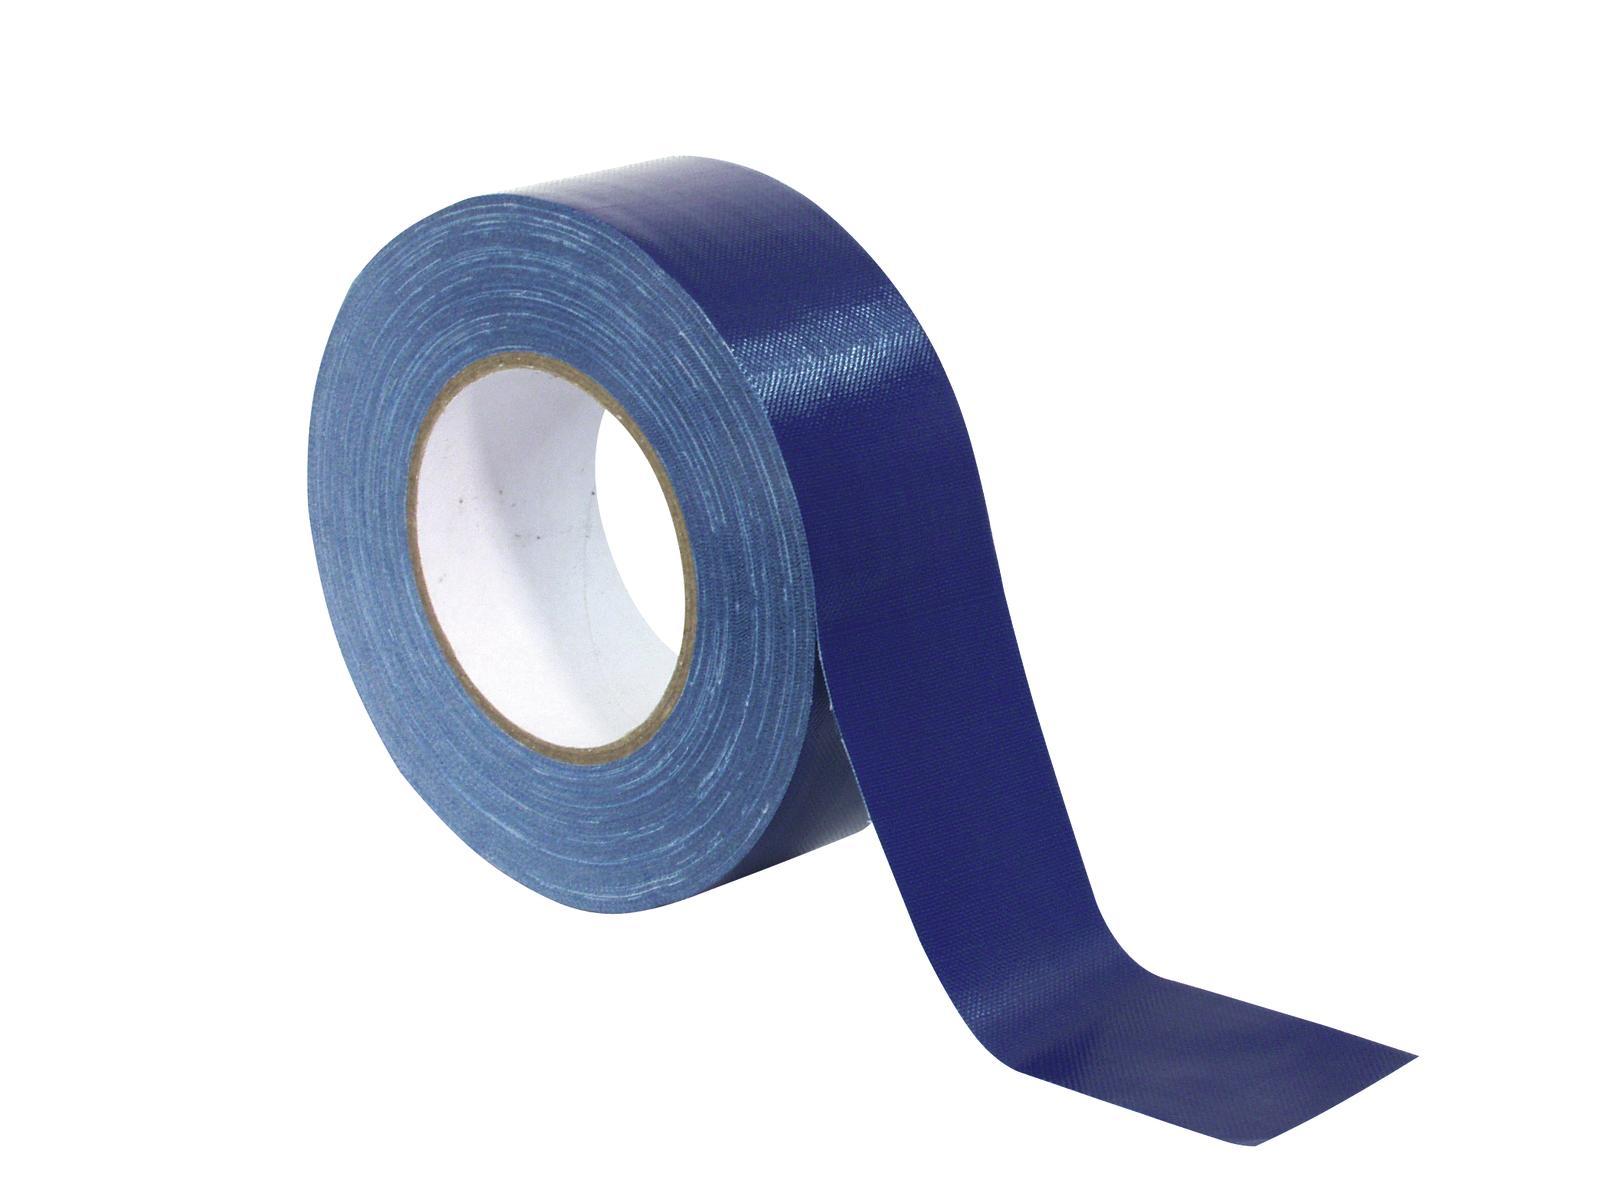 ACCESSORY Gaffa Tape Pro 50mm x 50m blau